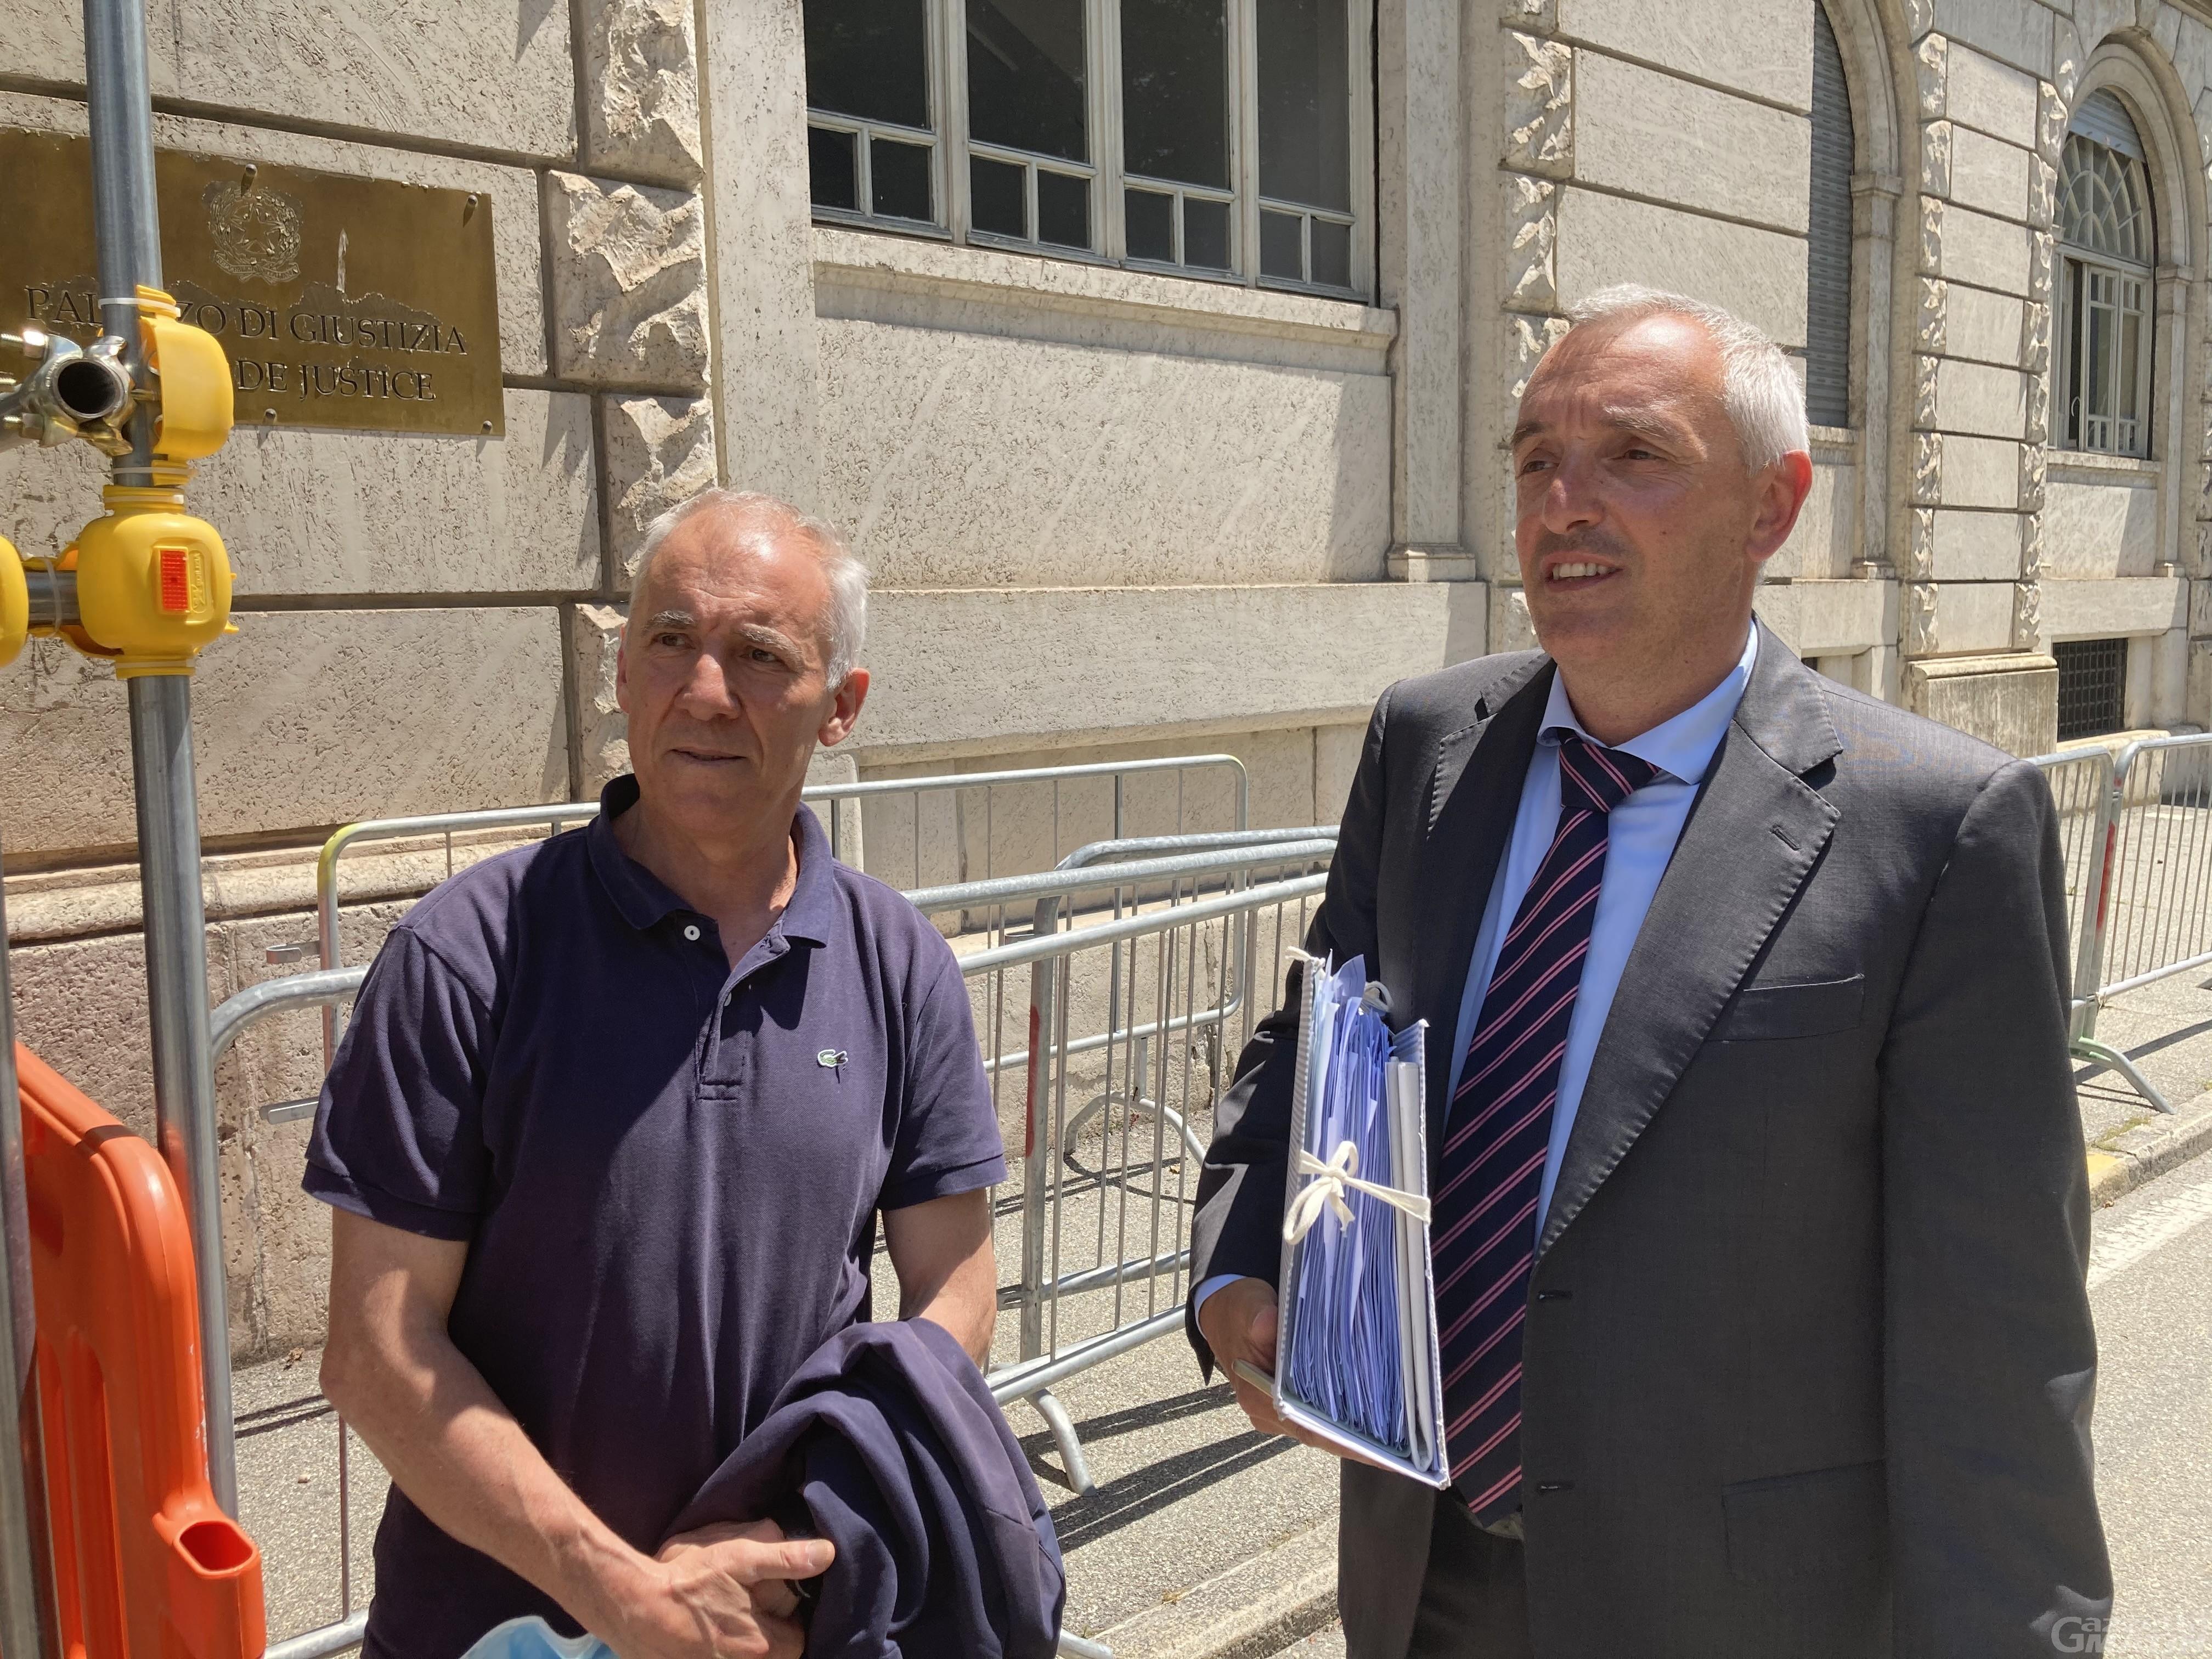 Abusivismo odontoiatrico a Saint-Christophe: tutti assolti i 4 imputati